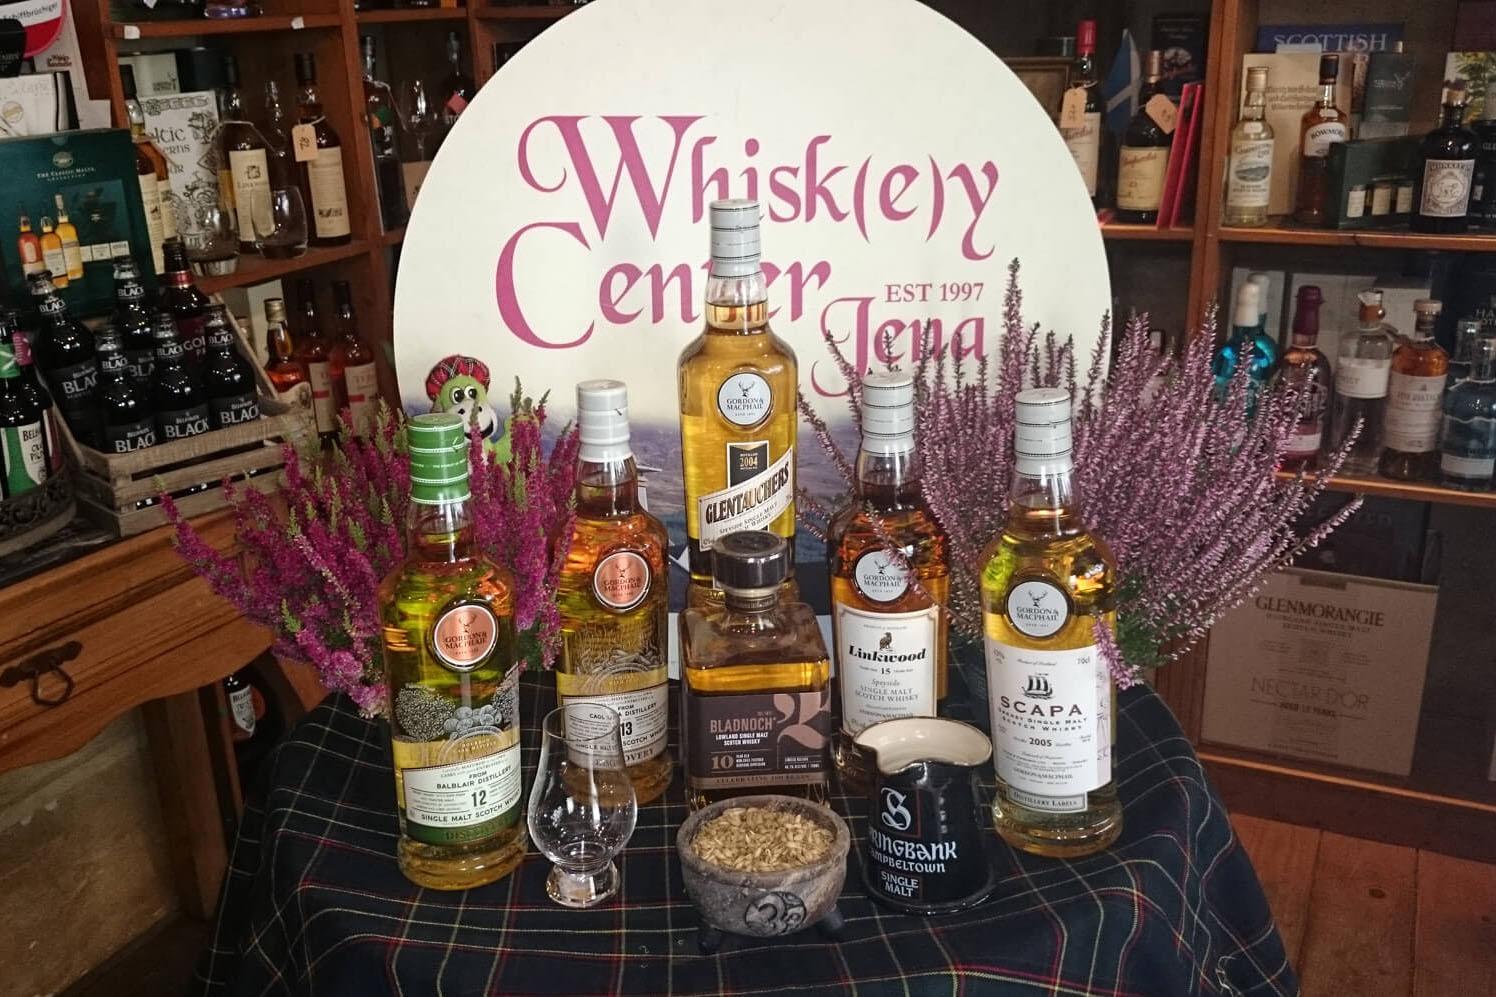 Whisky Center Jena Verkostung